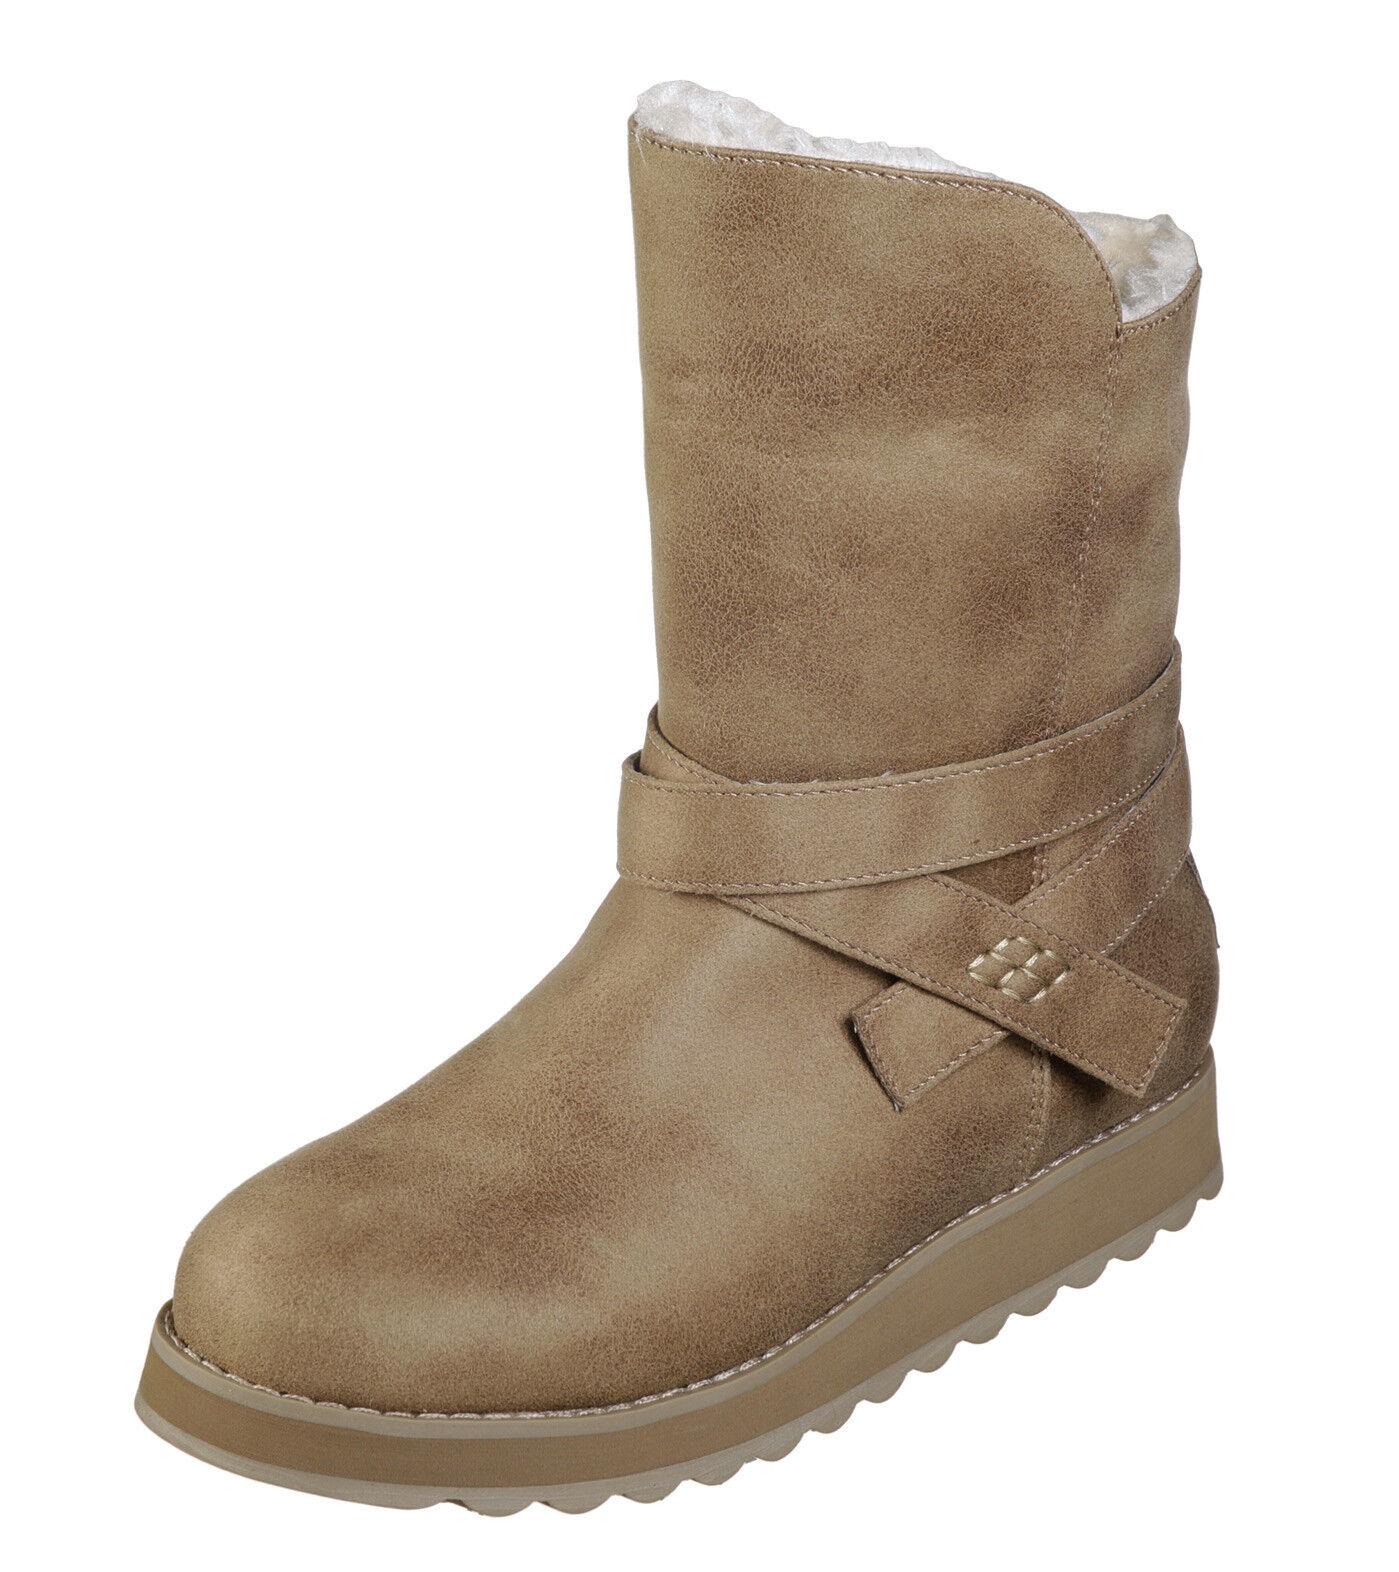 Skechers NEW Keepsakes 2.0 Pikes Peak taupe fashion ankle fur boots sizes 3-8